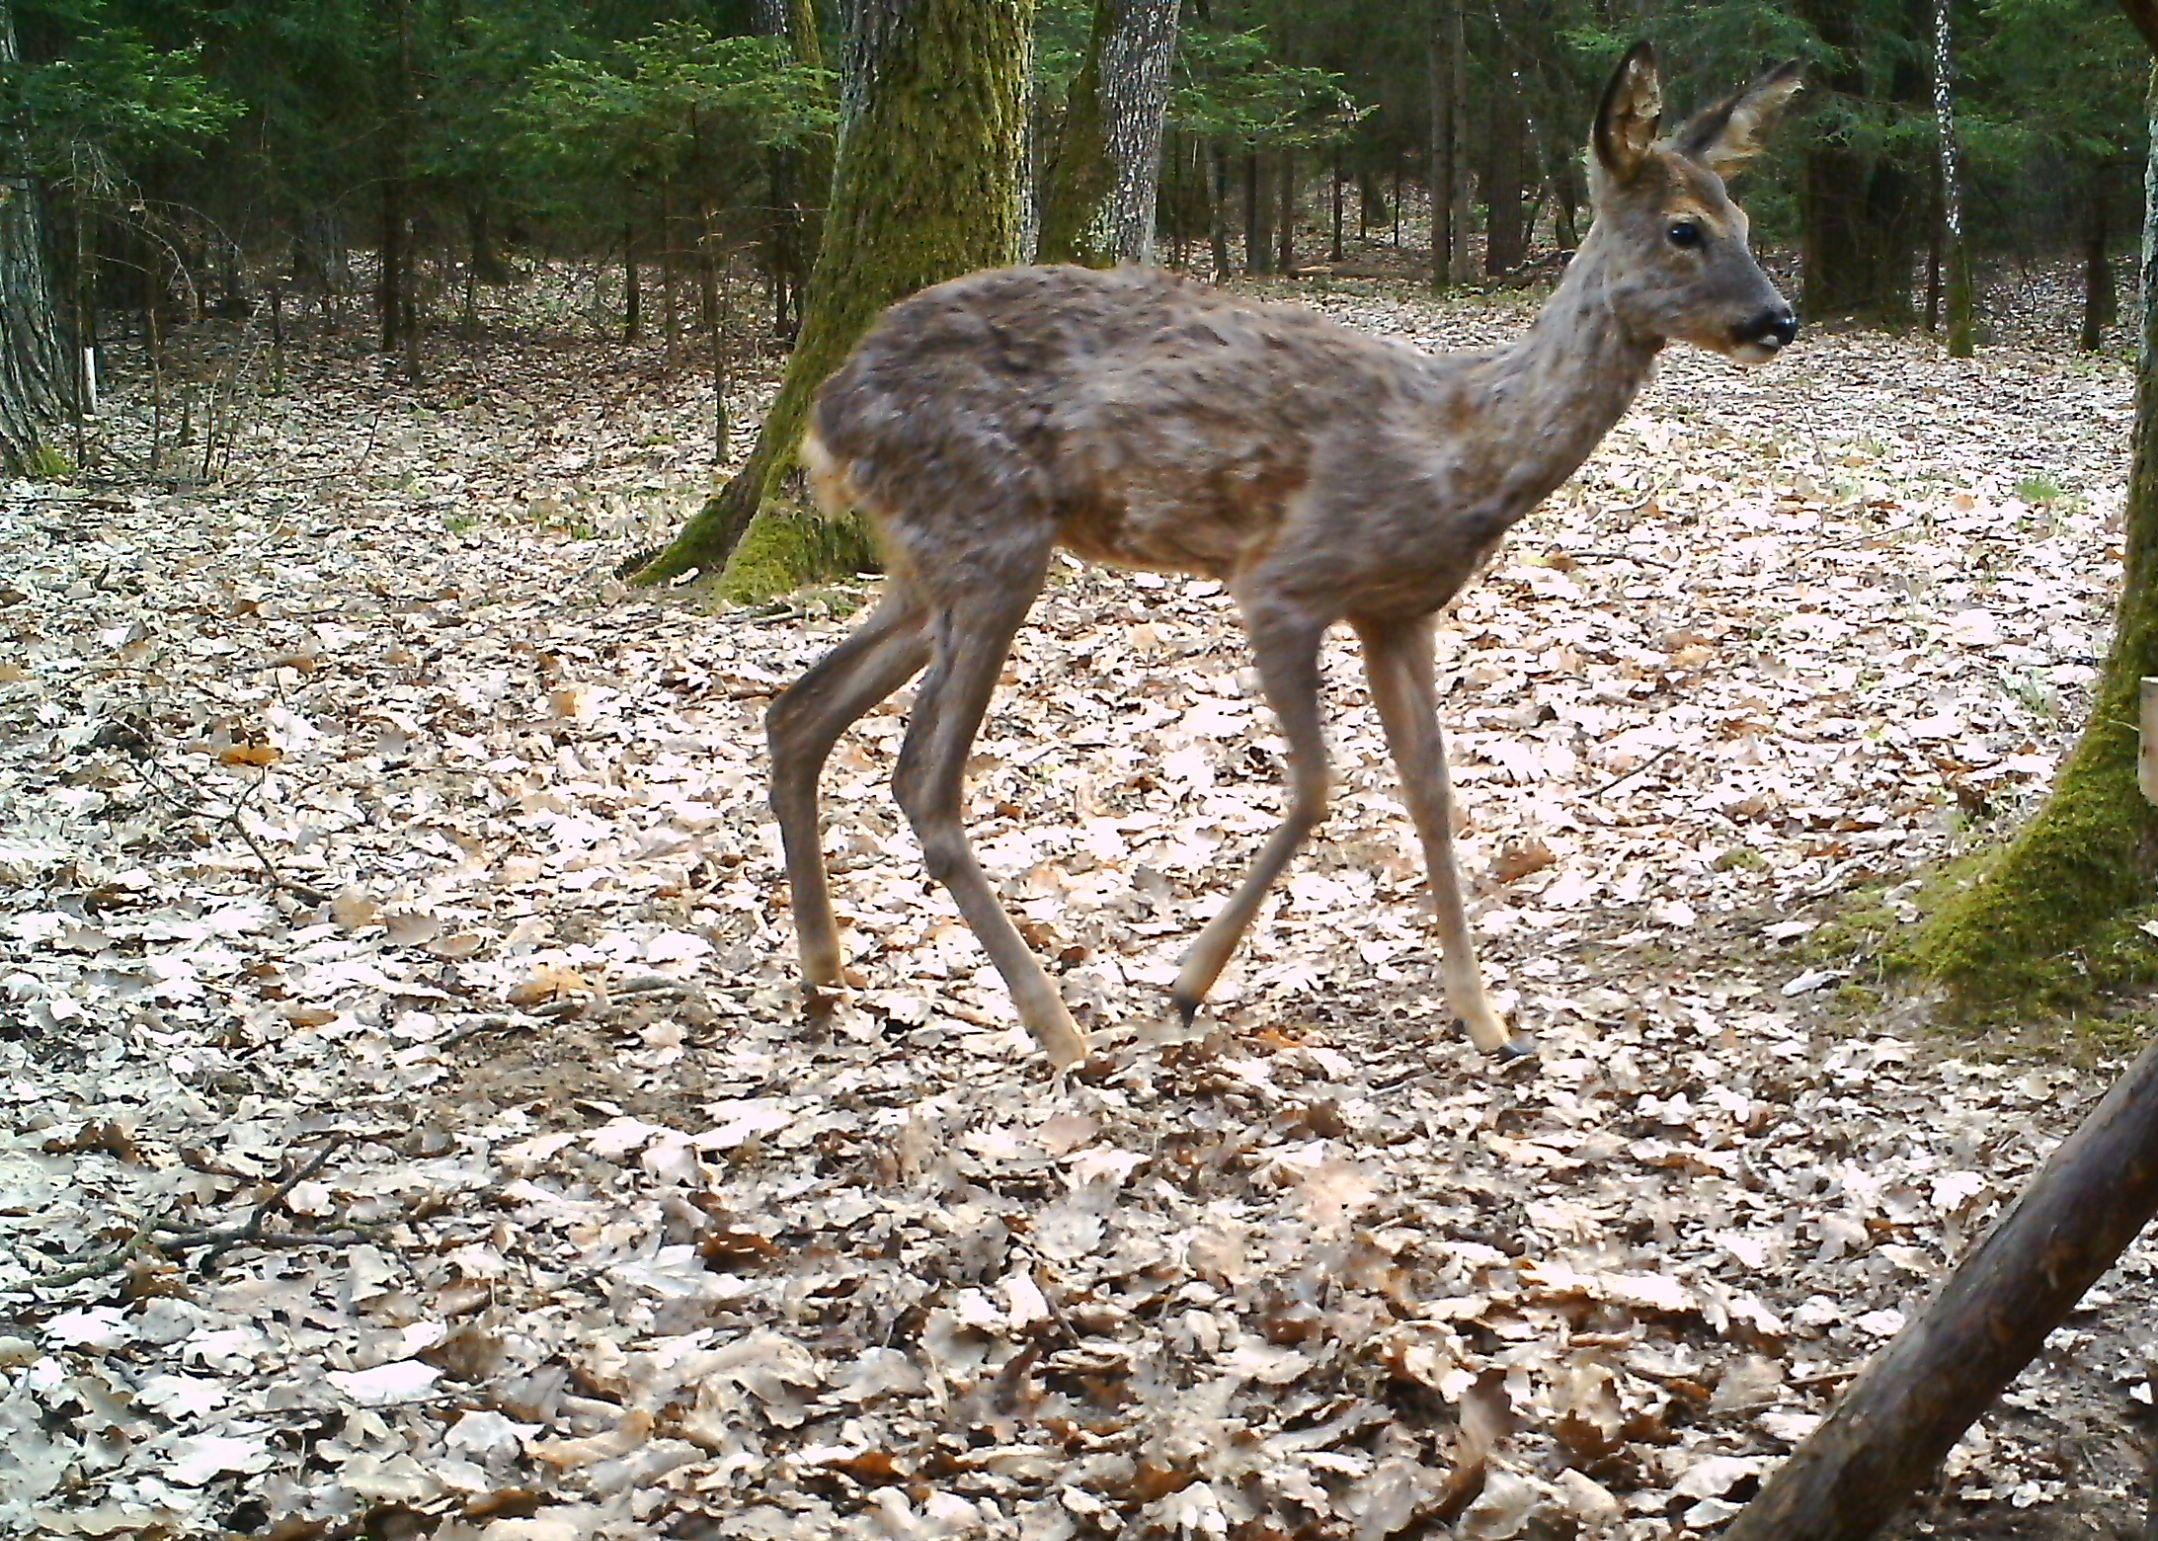 Vollmond Jagd Entfernungsmesser : Jagen u jagd und natur